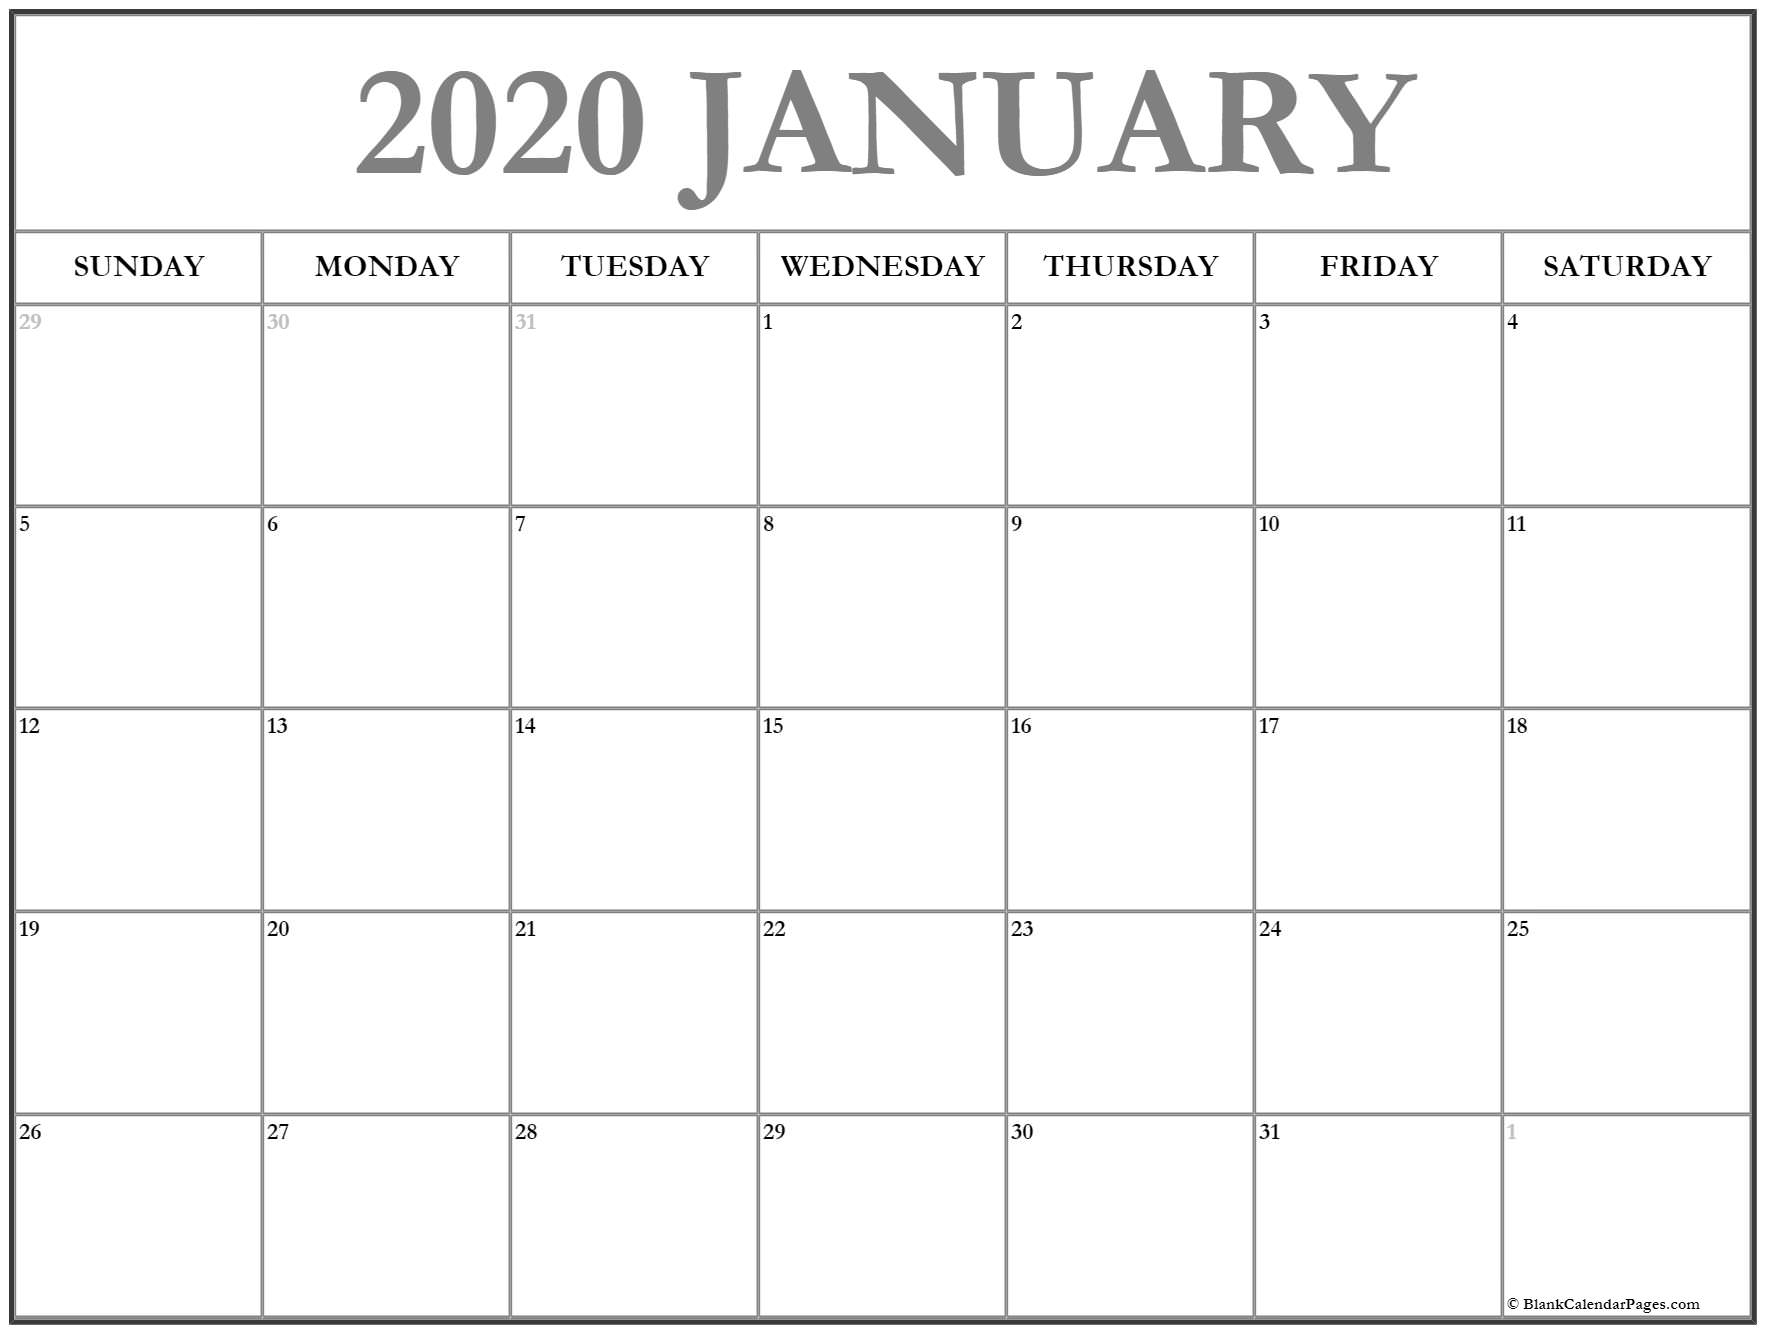 January 2020 Calendar | Free Printable Monthly Calendars within Free Printable Calendar 2020 Motivational